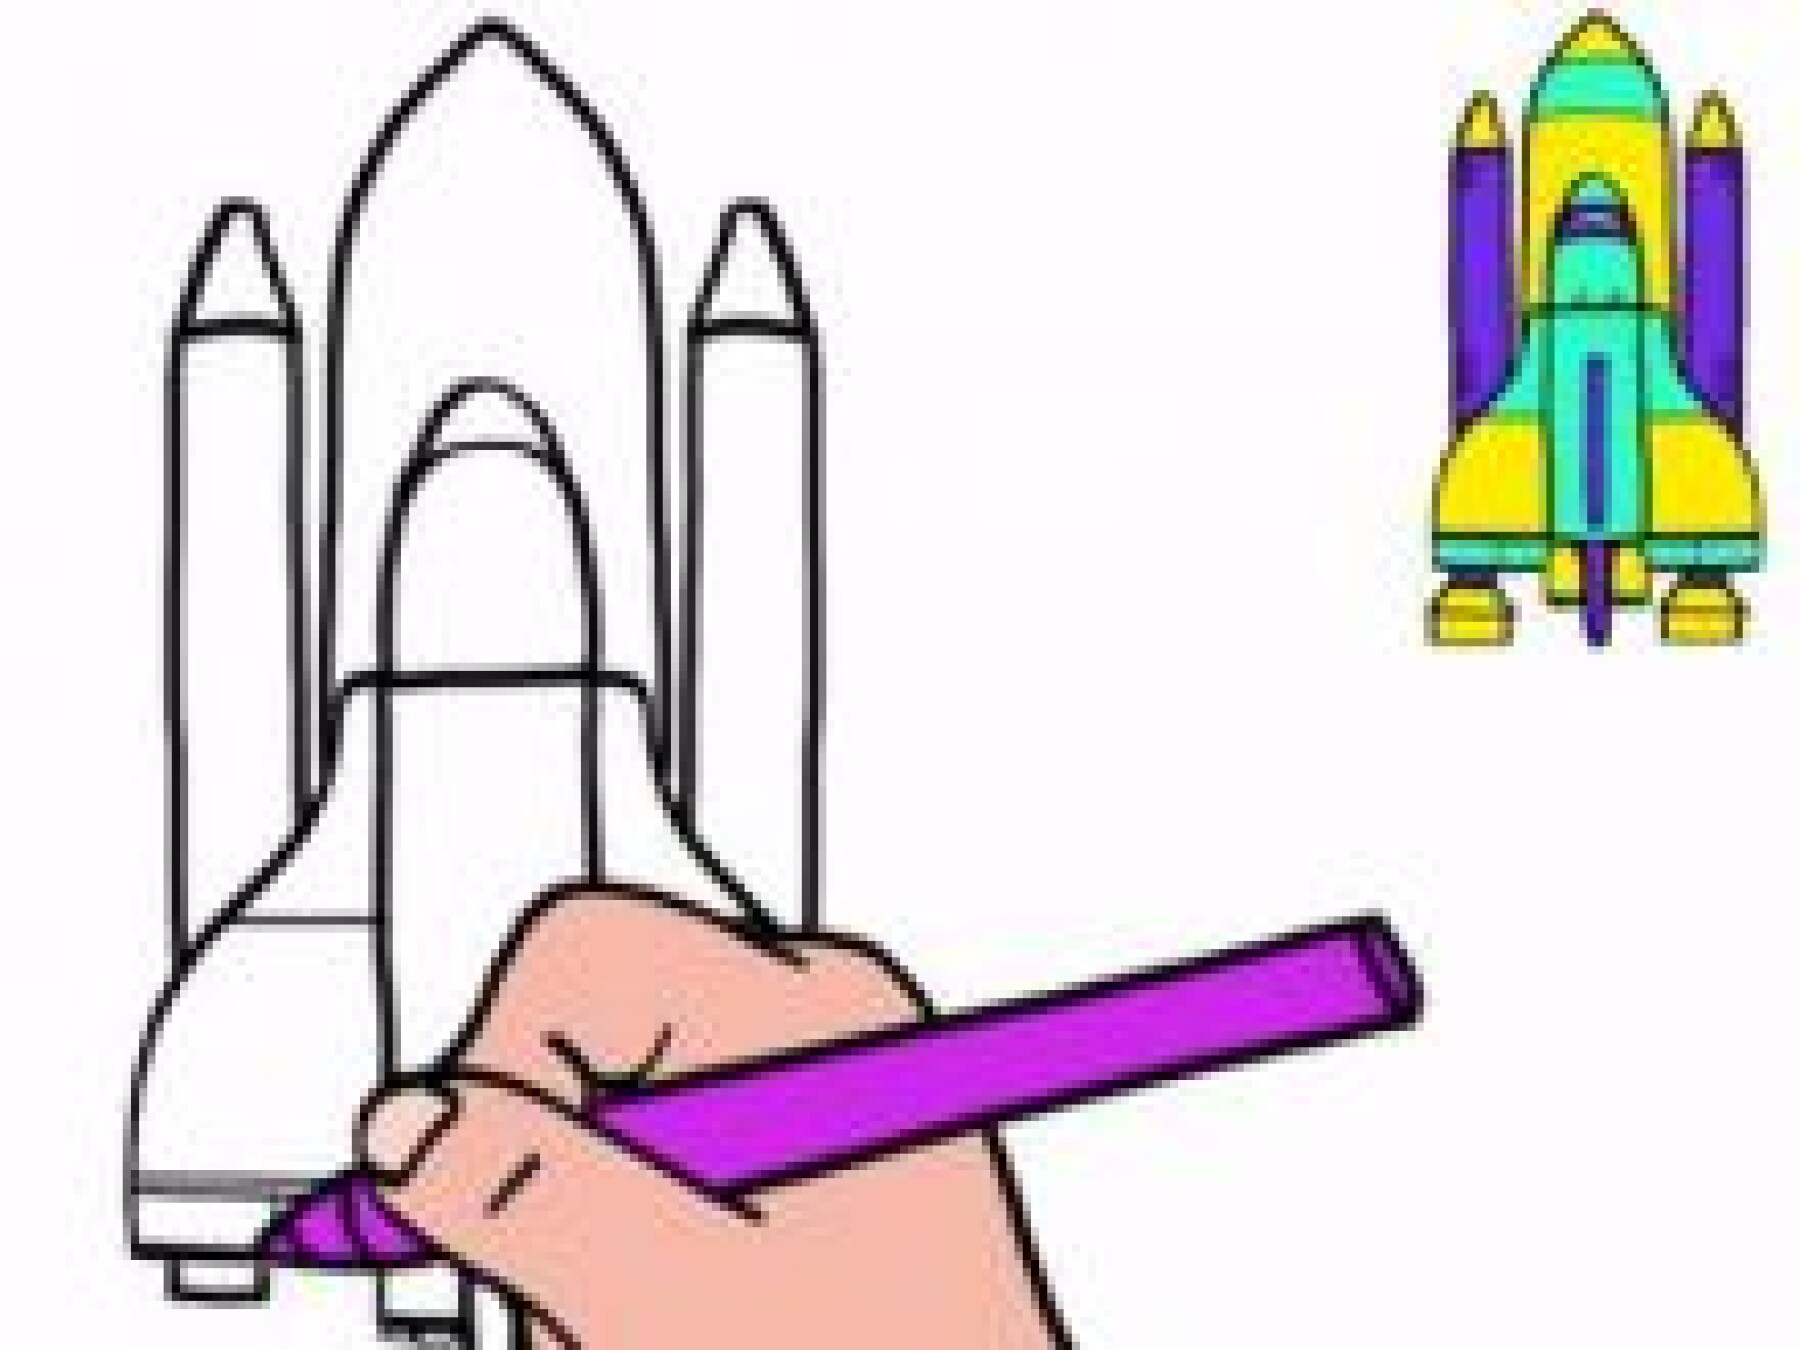 Dessiner une fusée